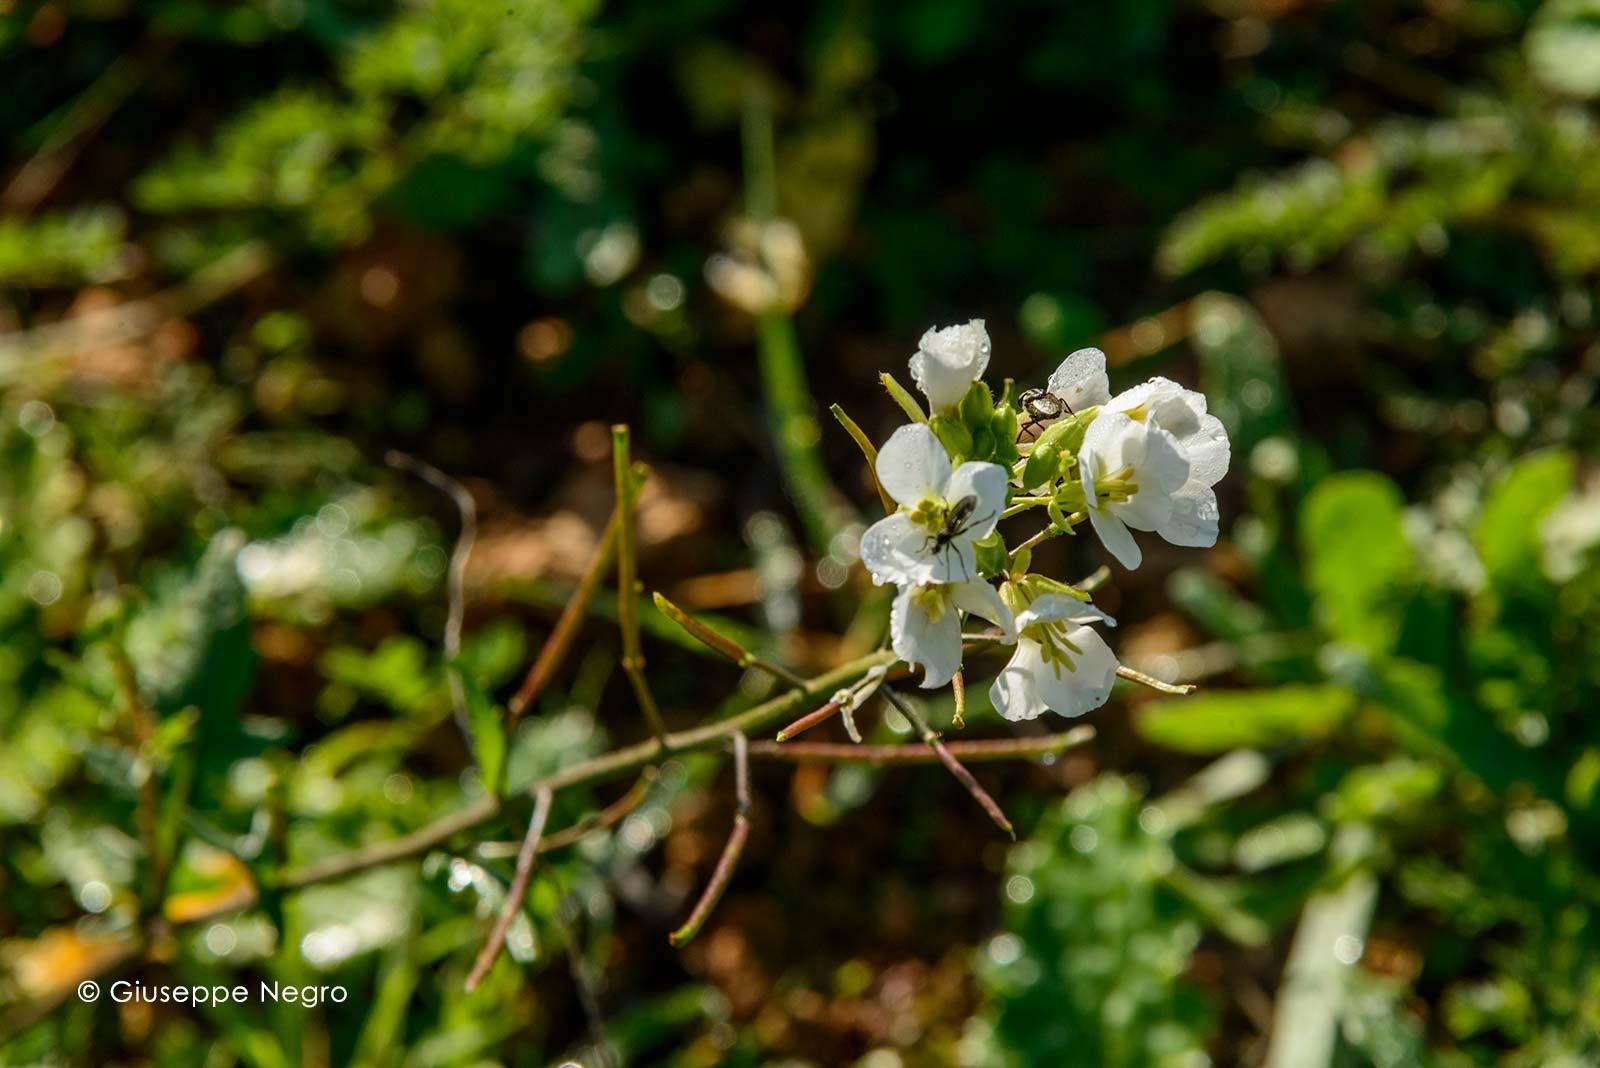 senape-bianca-0850